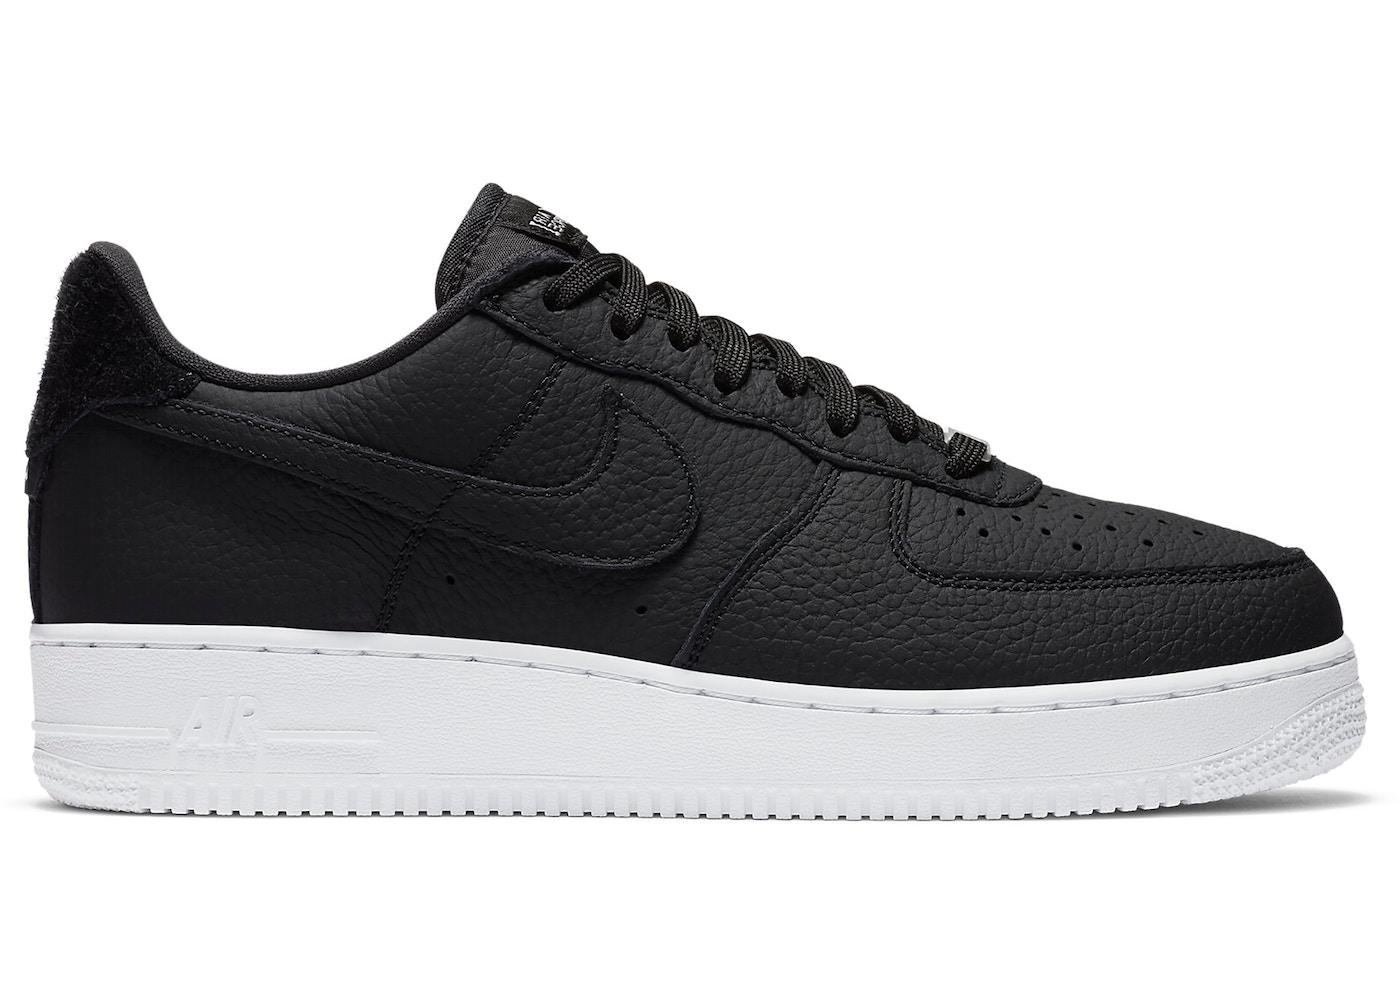 Nike Air Force 1 Craft Black